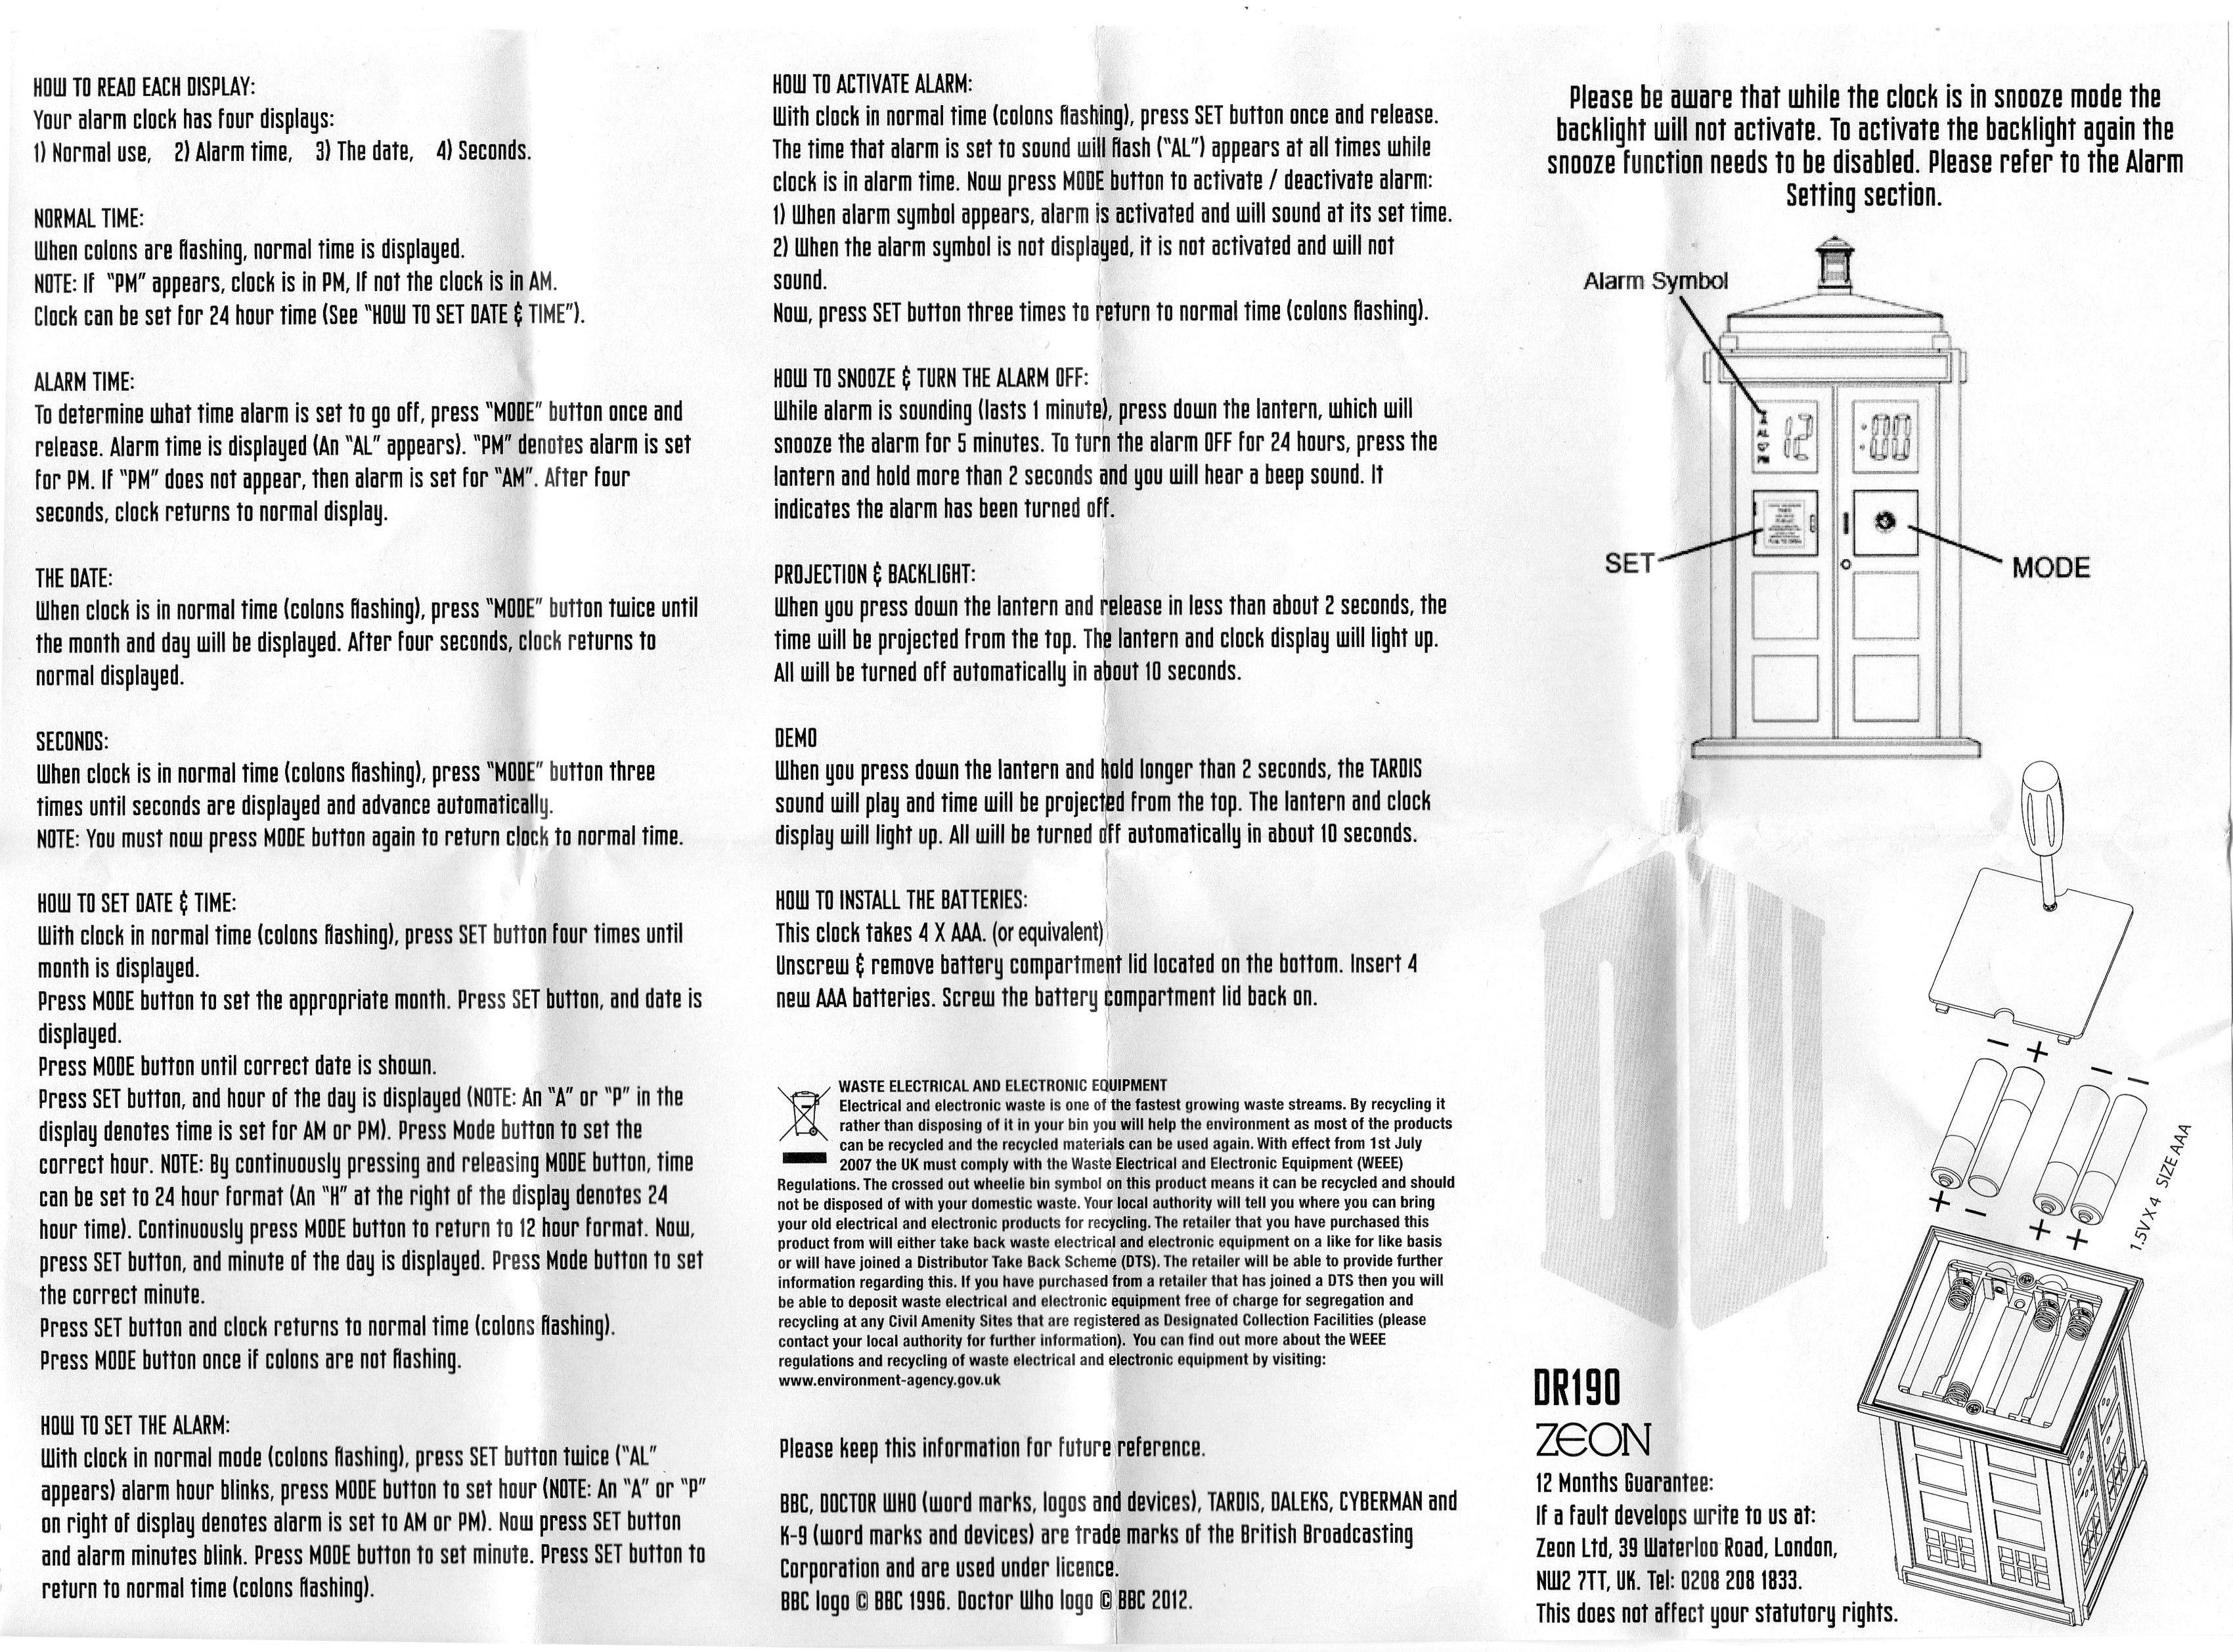 teac alarm clock instructions